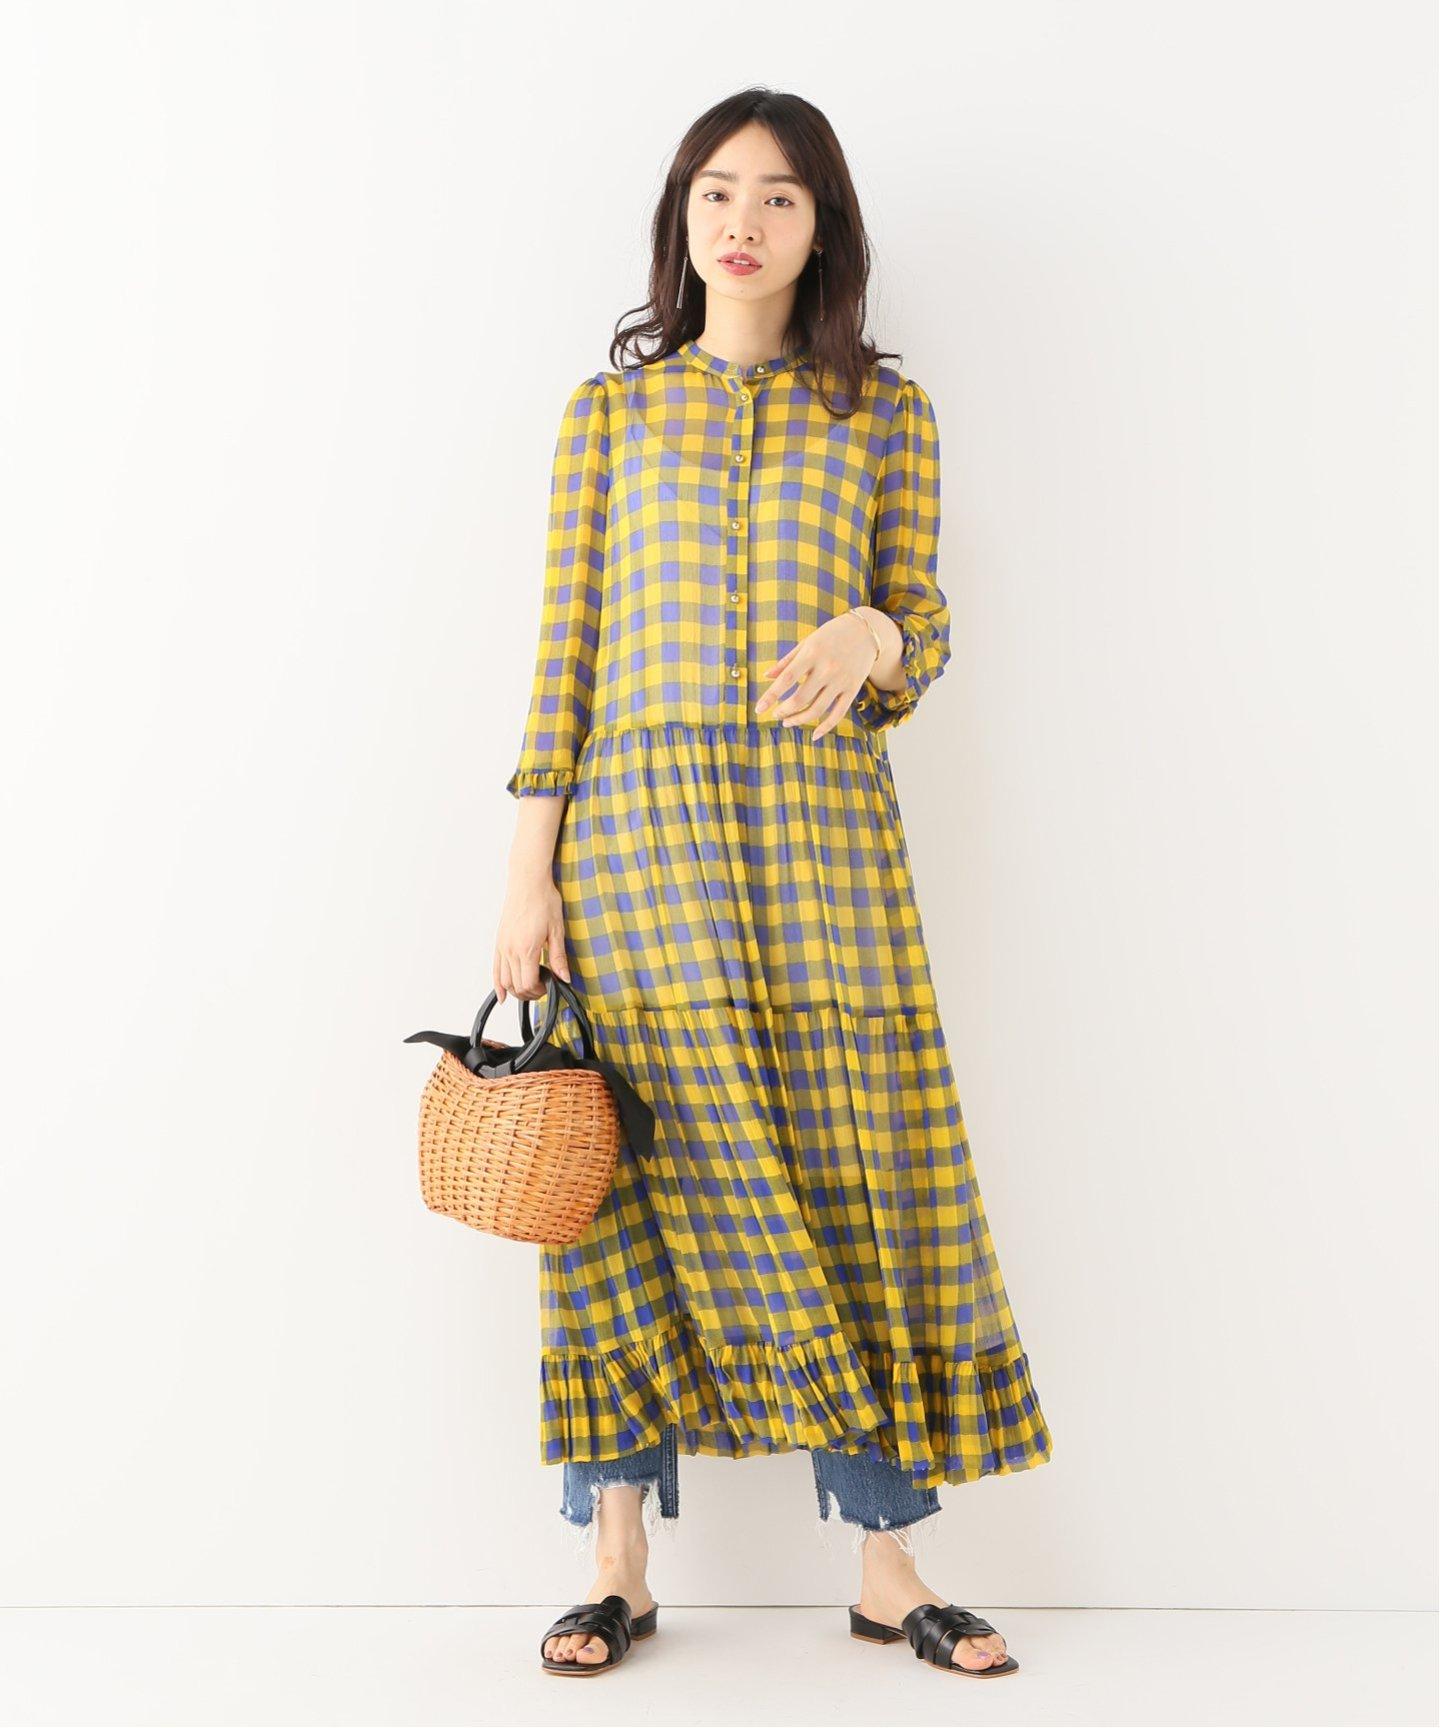 baum und pferdgarten チェックワンピース iena イエナ 公式のファッション通販 19040910010610 baycrew s store pakaian kasual pakaian kasual